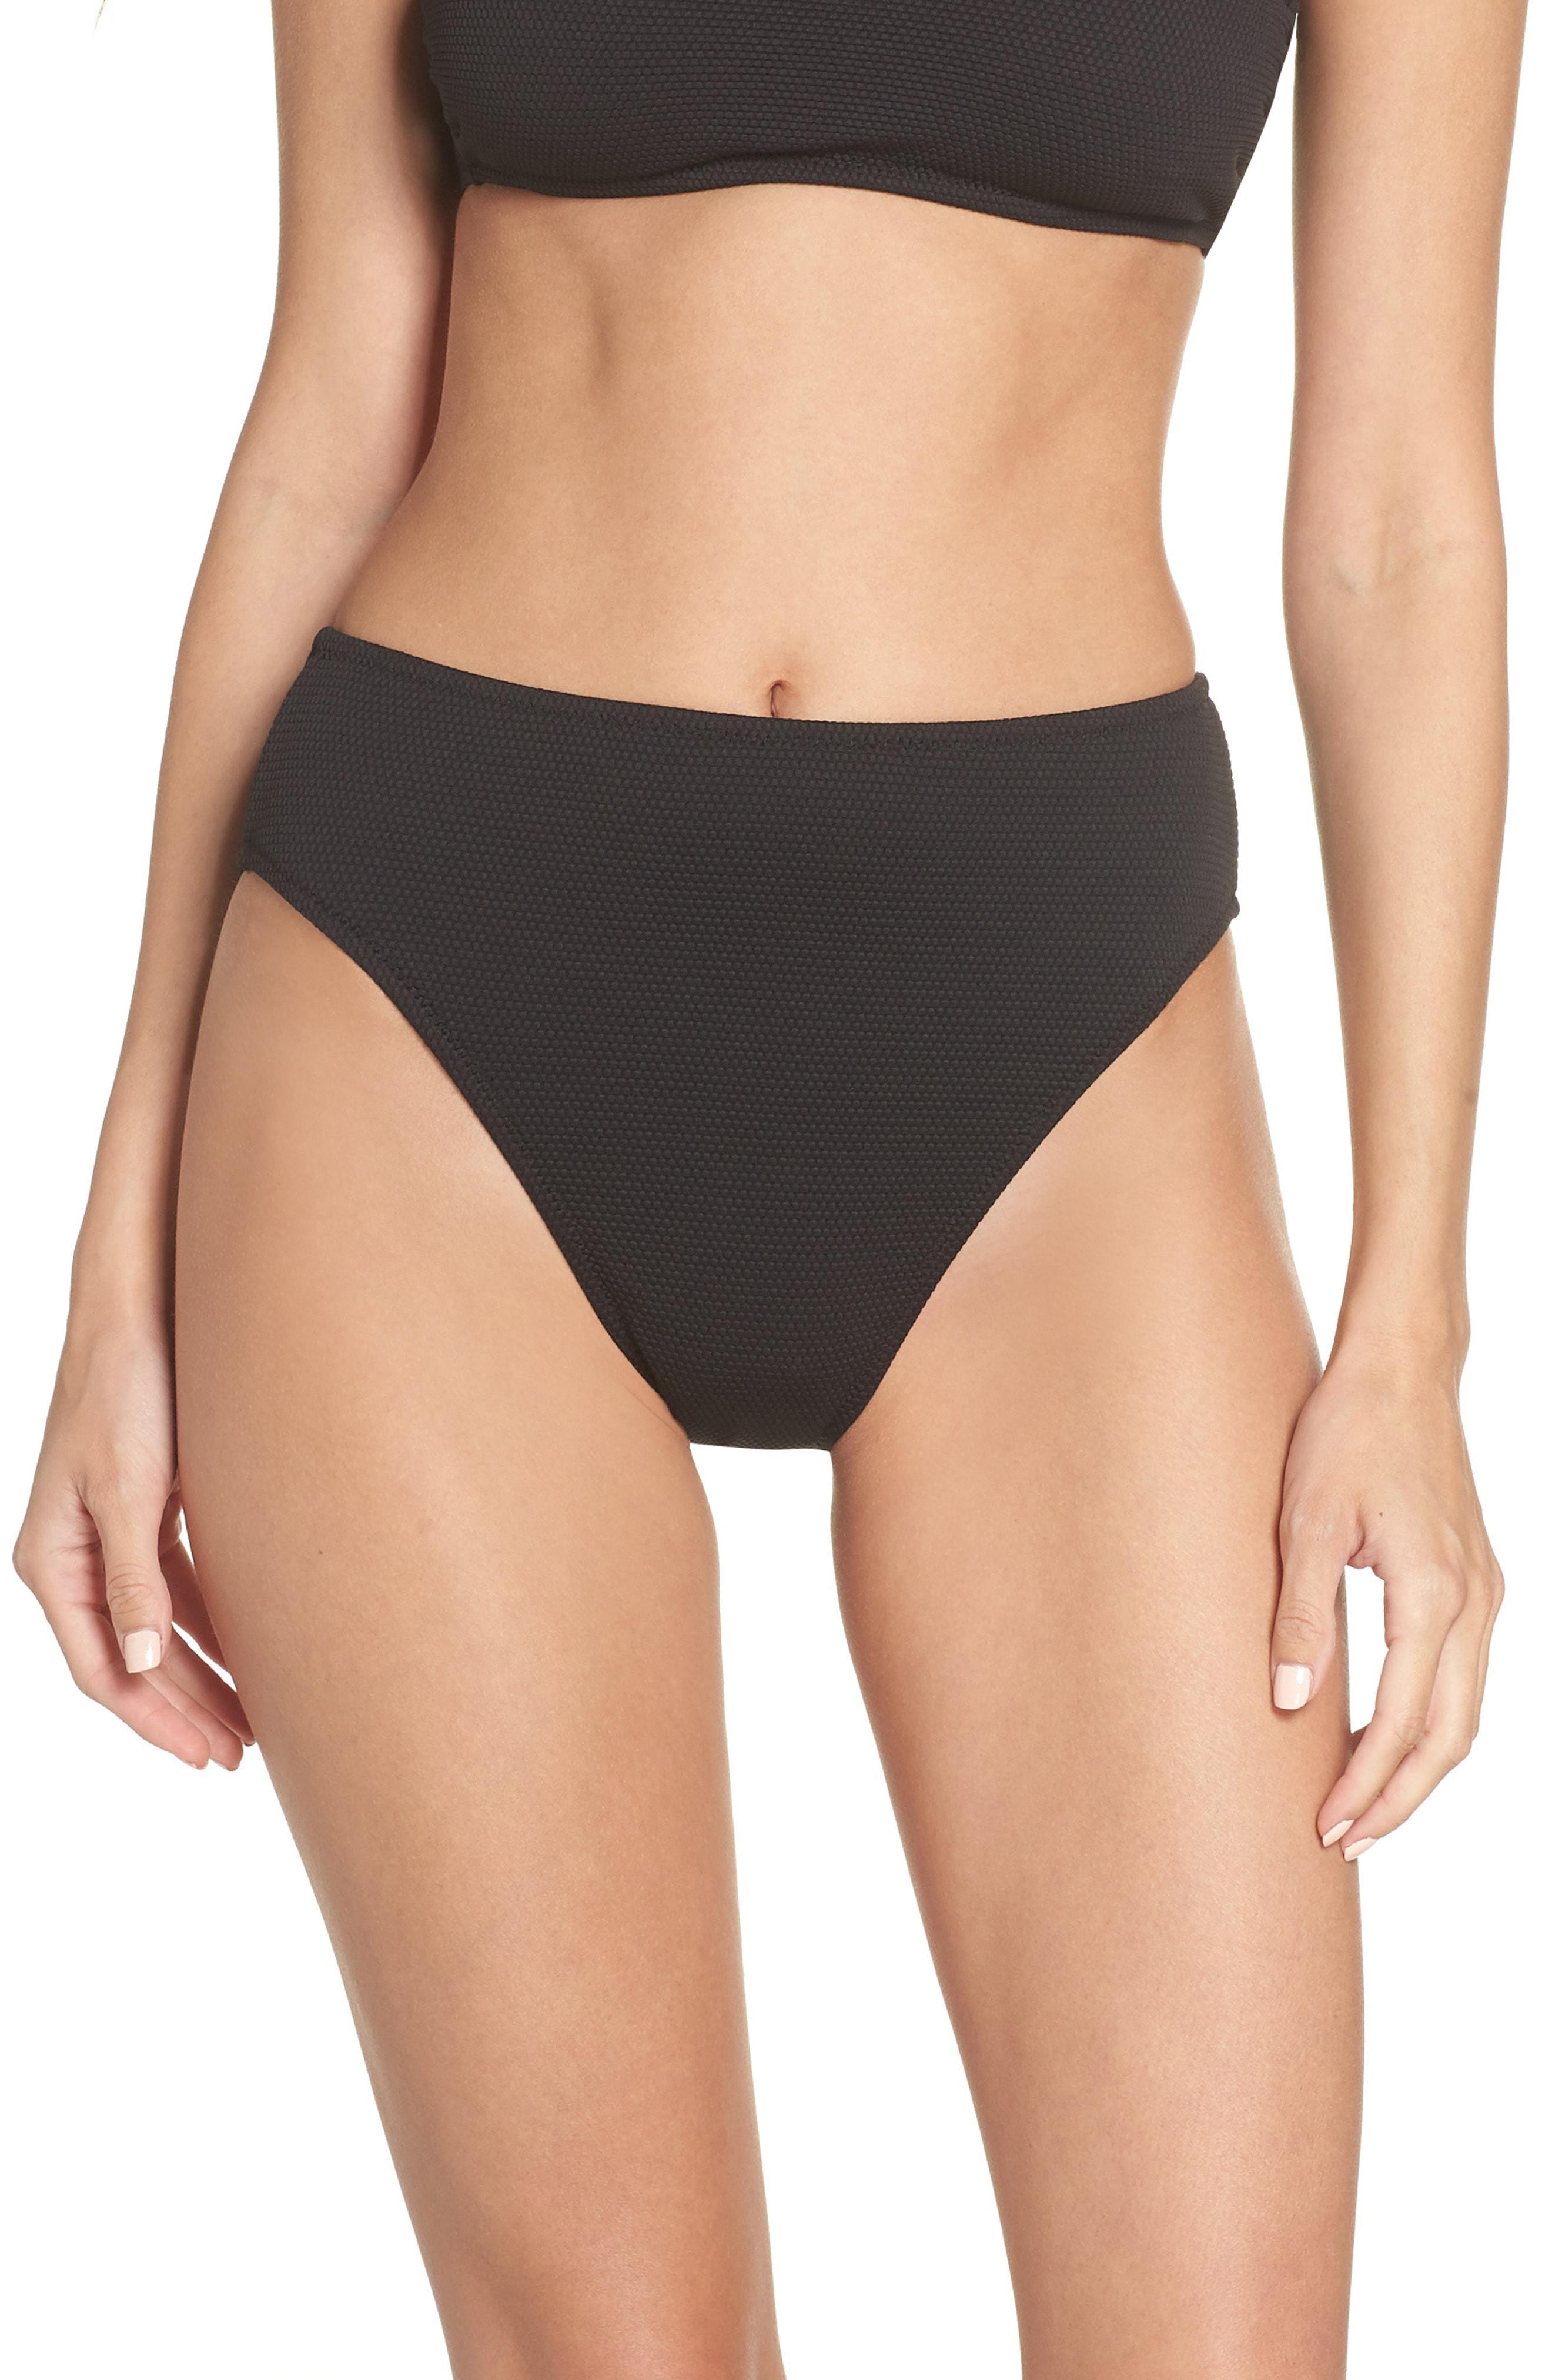 dfe28787020 Leith - Black High Waist Bikini Bottoms - Lyst. View fullscreen